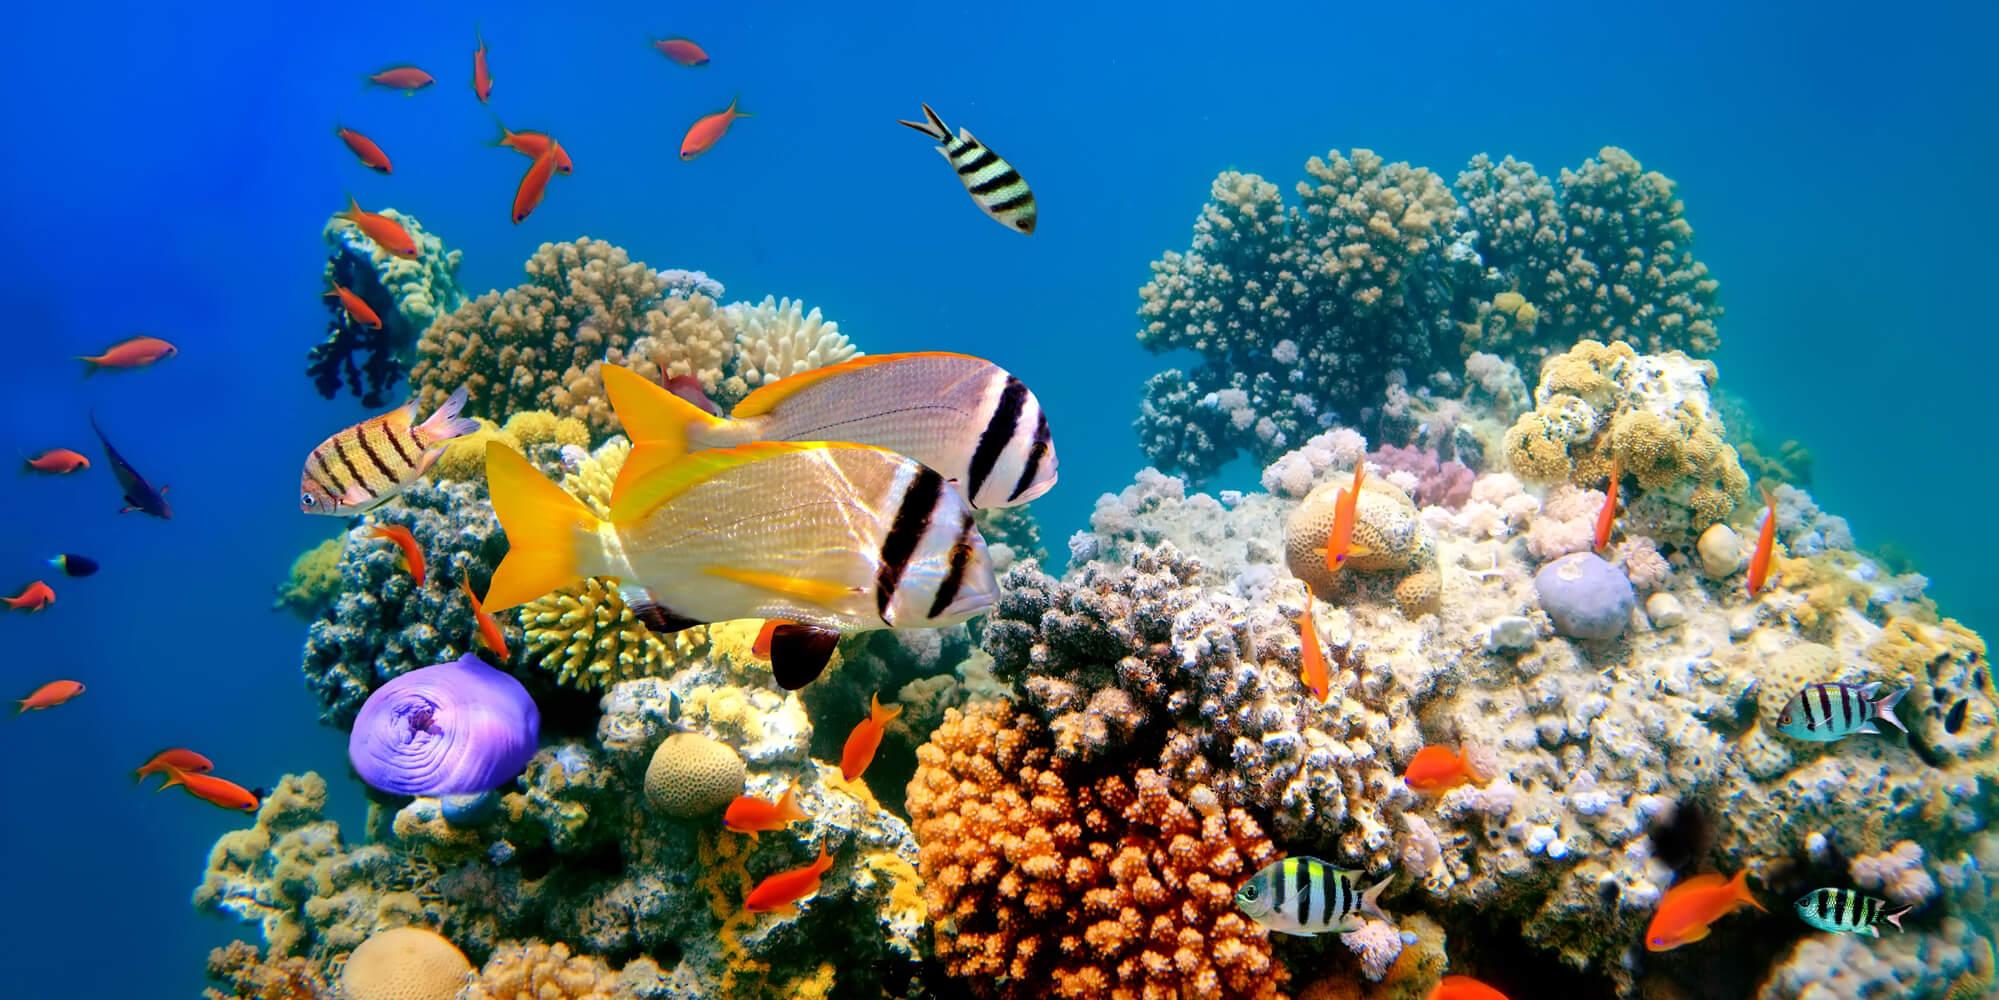 marine ocean ecosystem